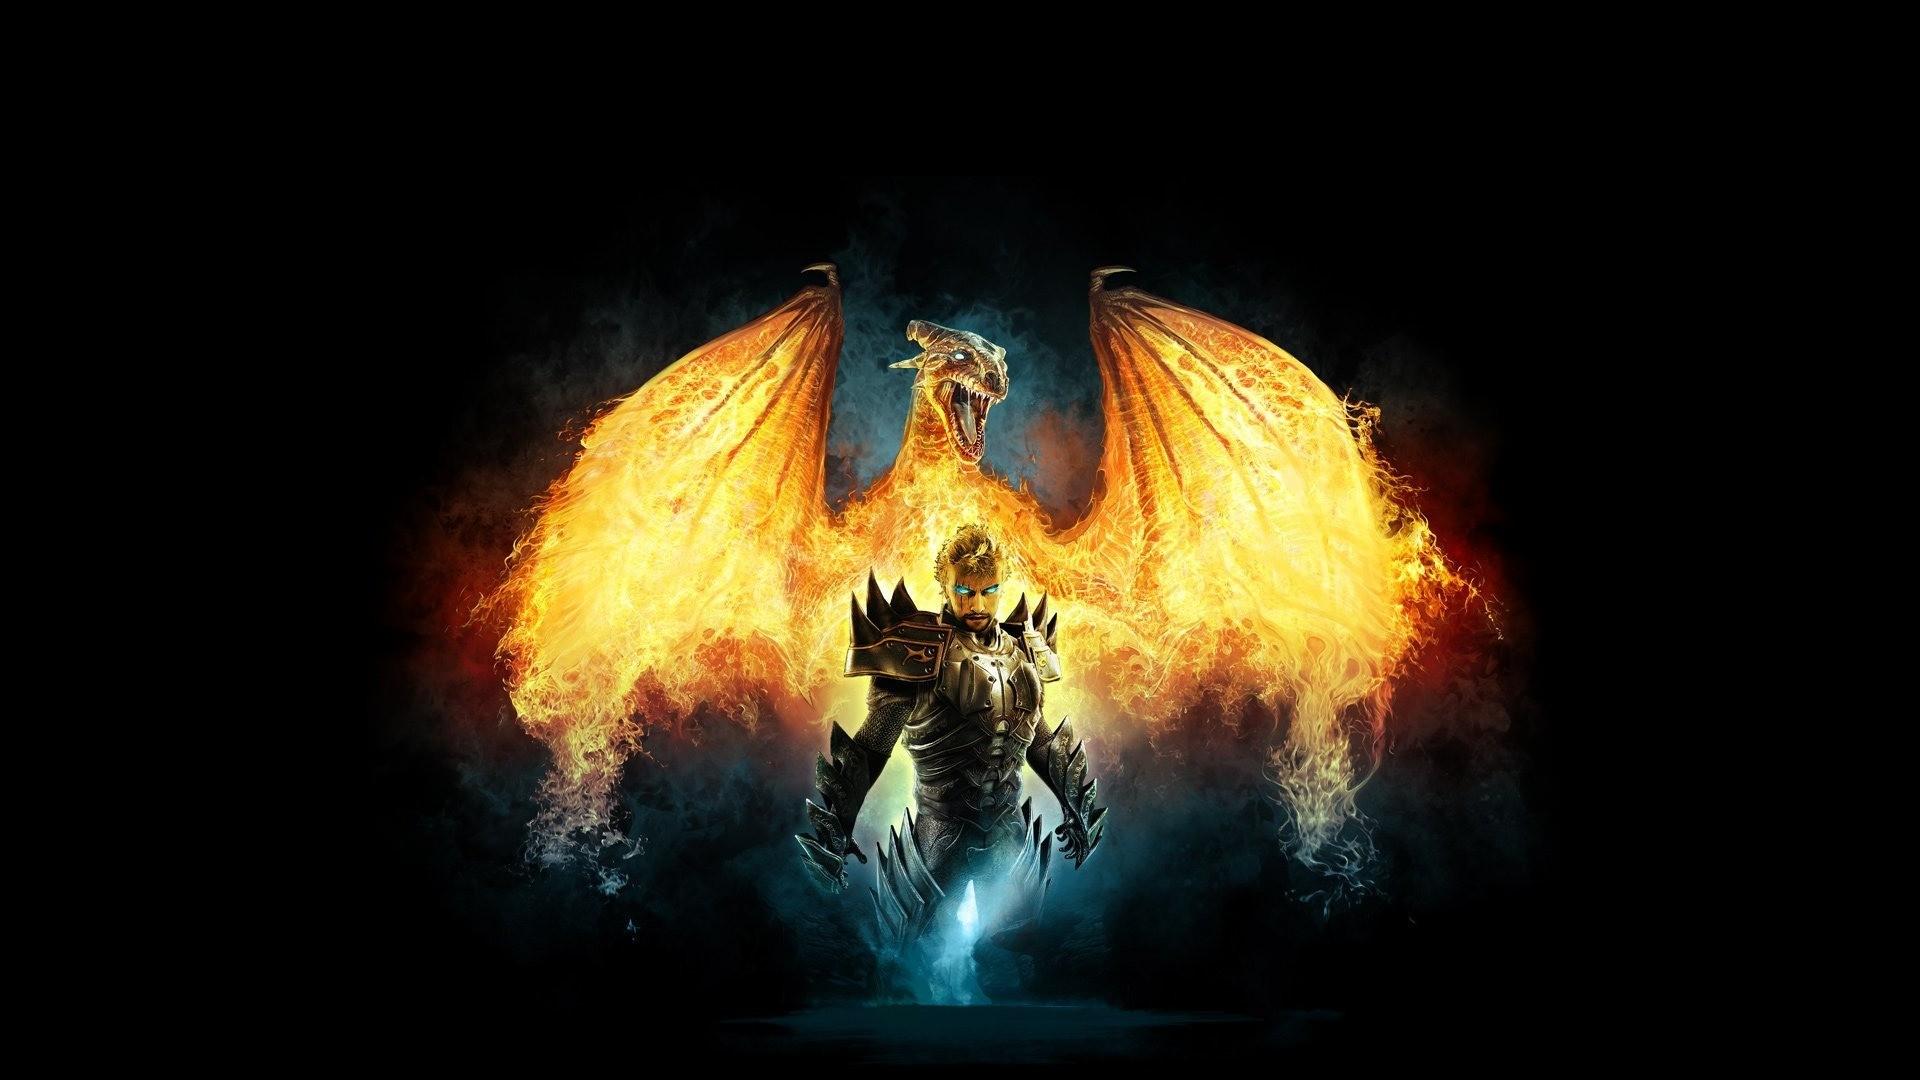 Fire Dragon | Dragon on Fire Wallpaper | HD | Wallpapers